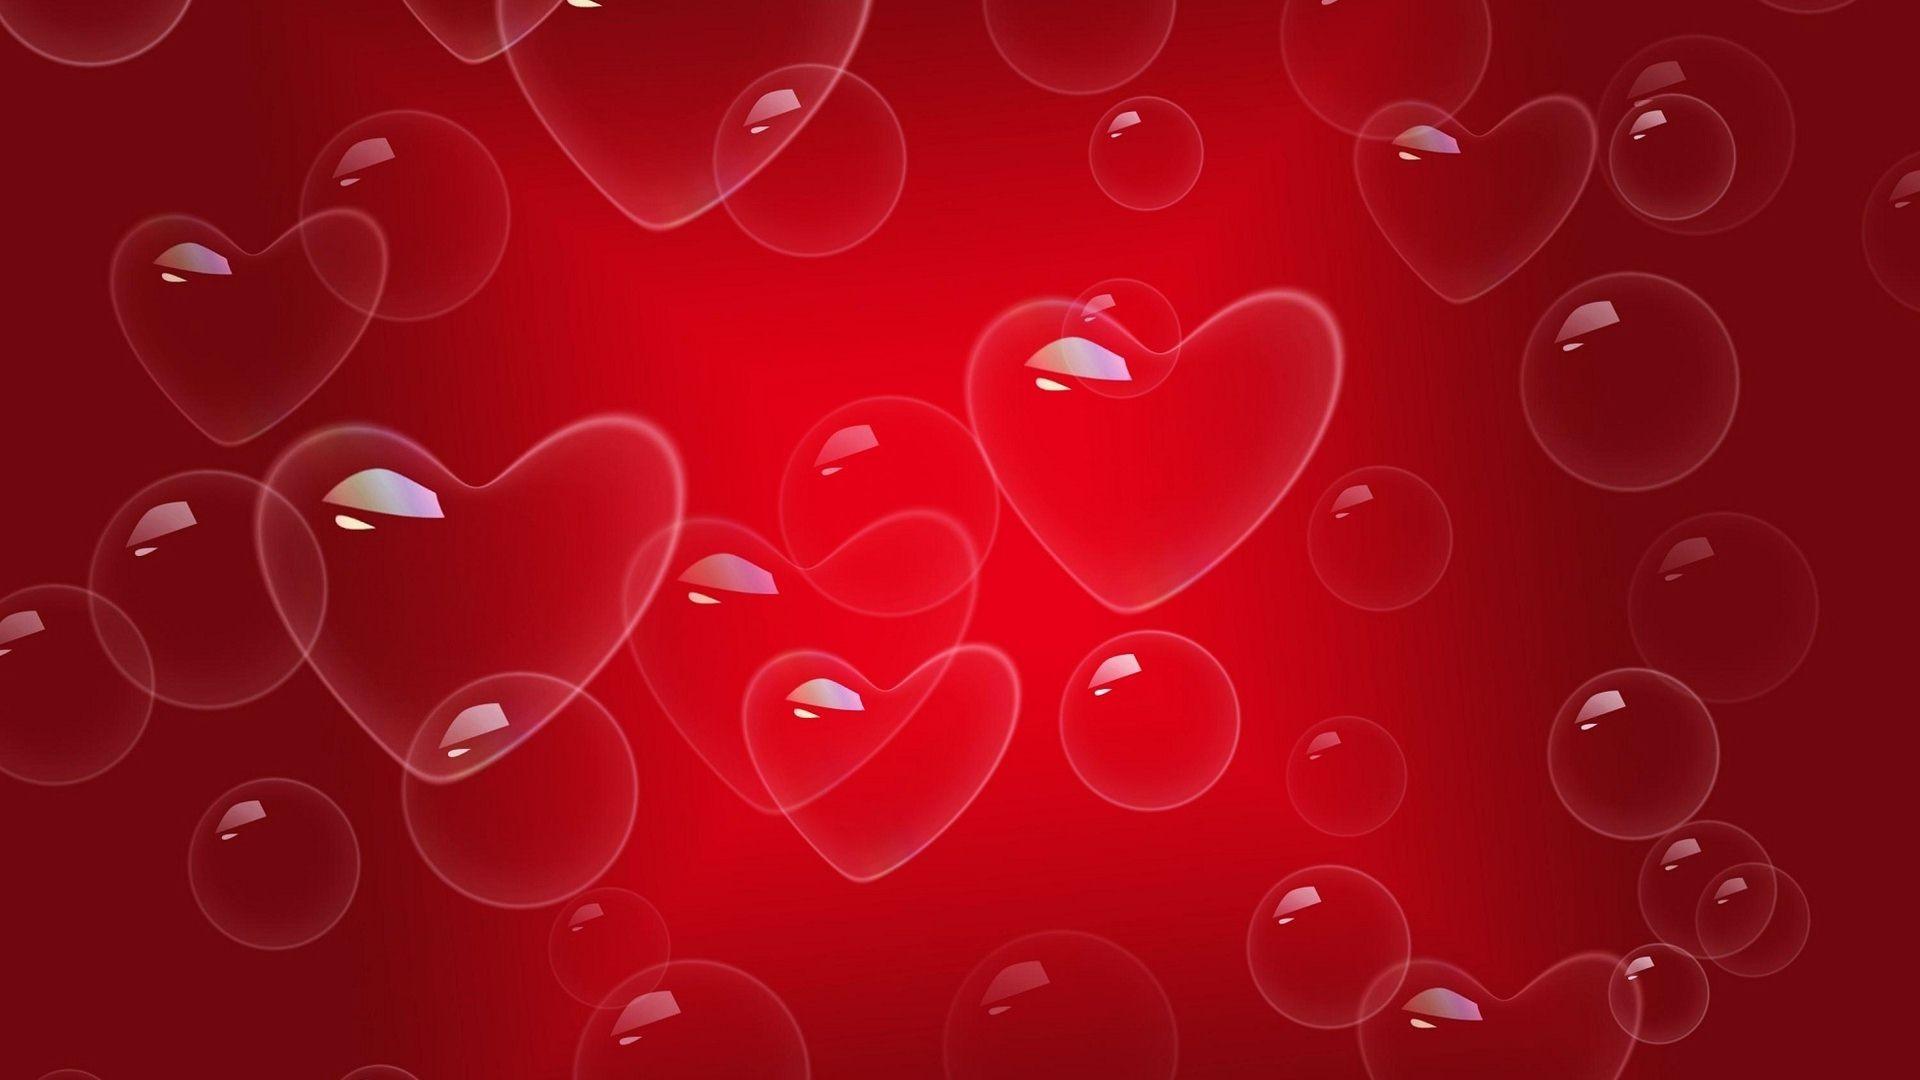 Love Heart Wallpaper Hd Wallpapertag: Red Background HD ·① Download Free Beautiful Full HD